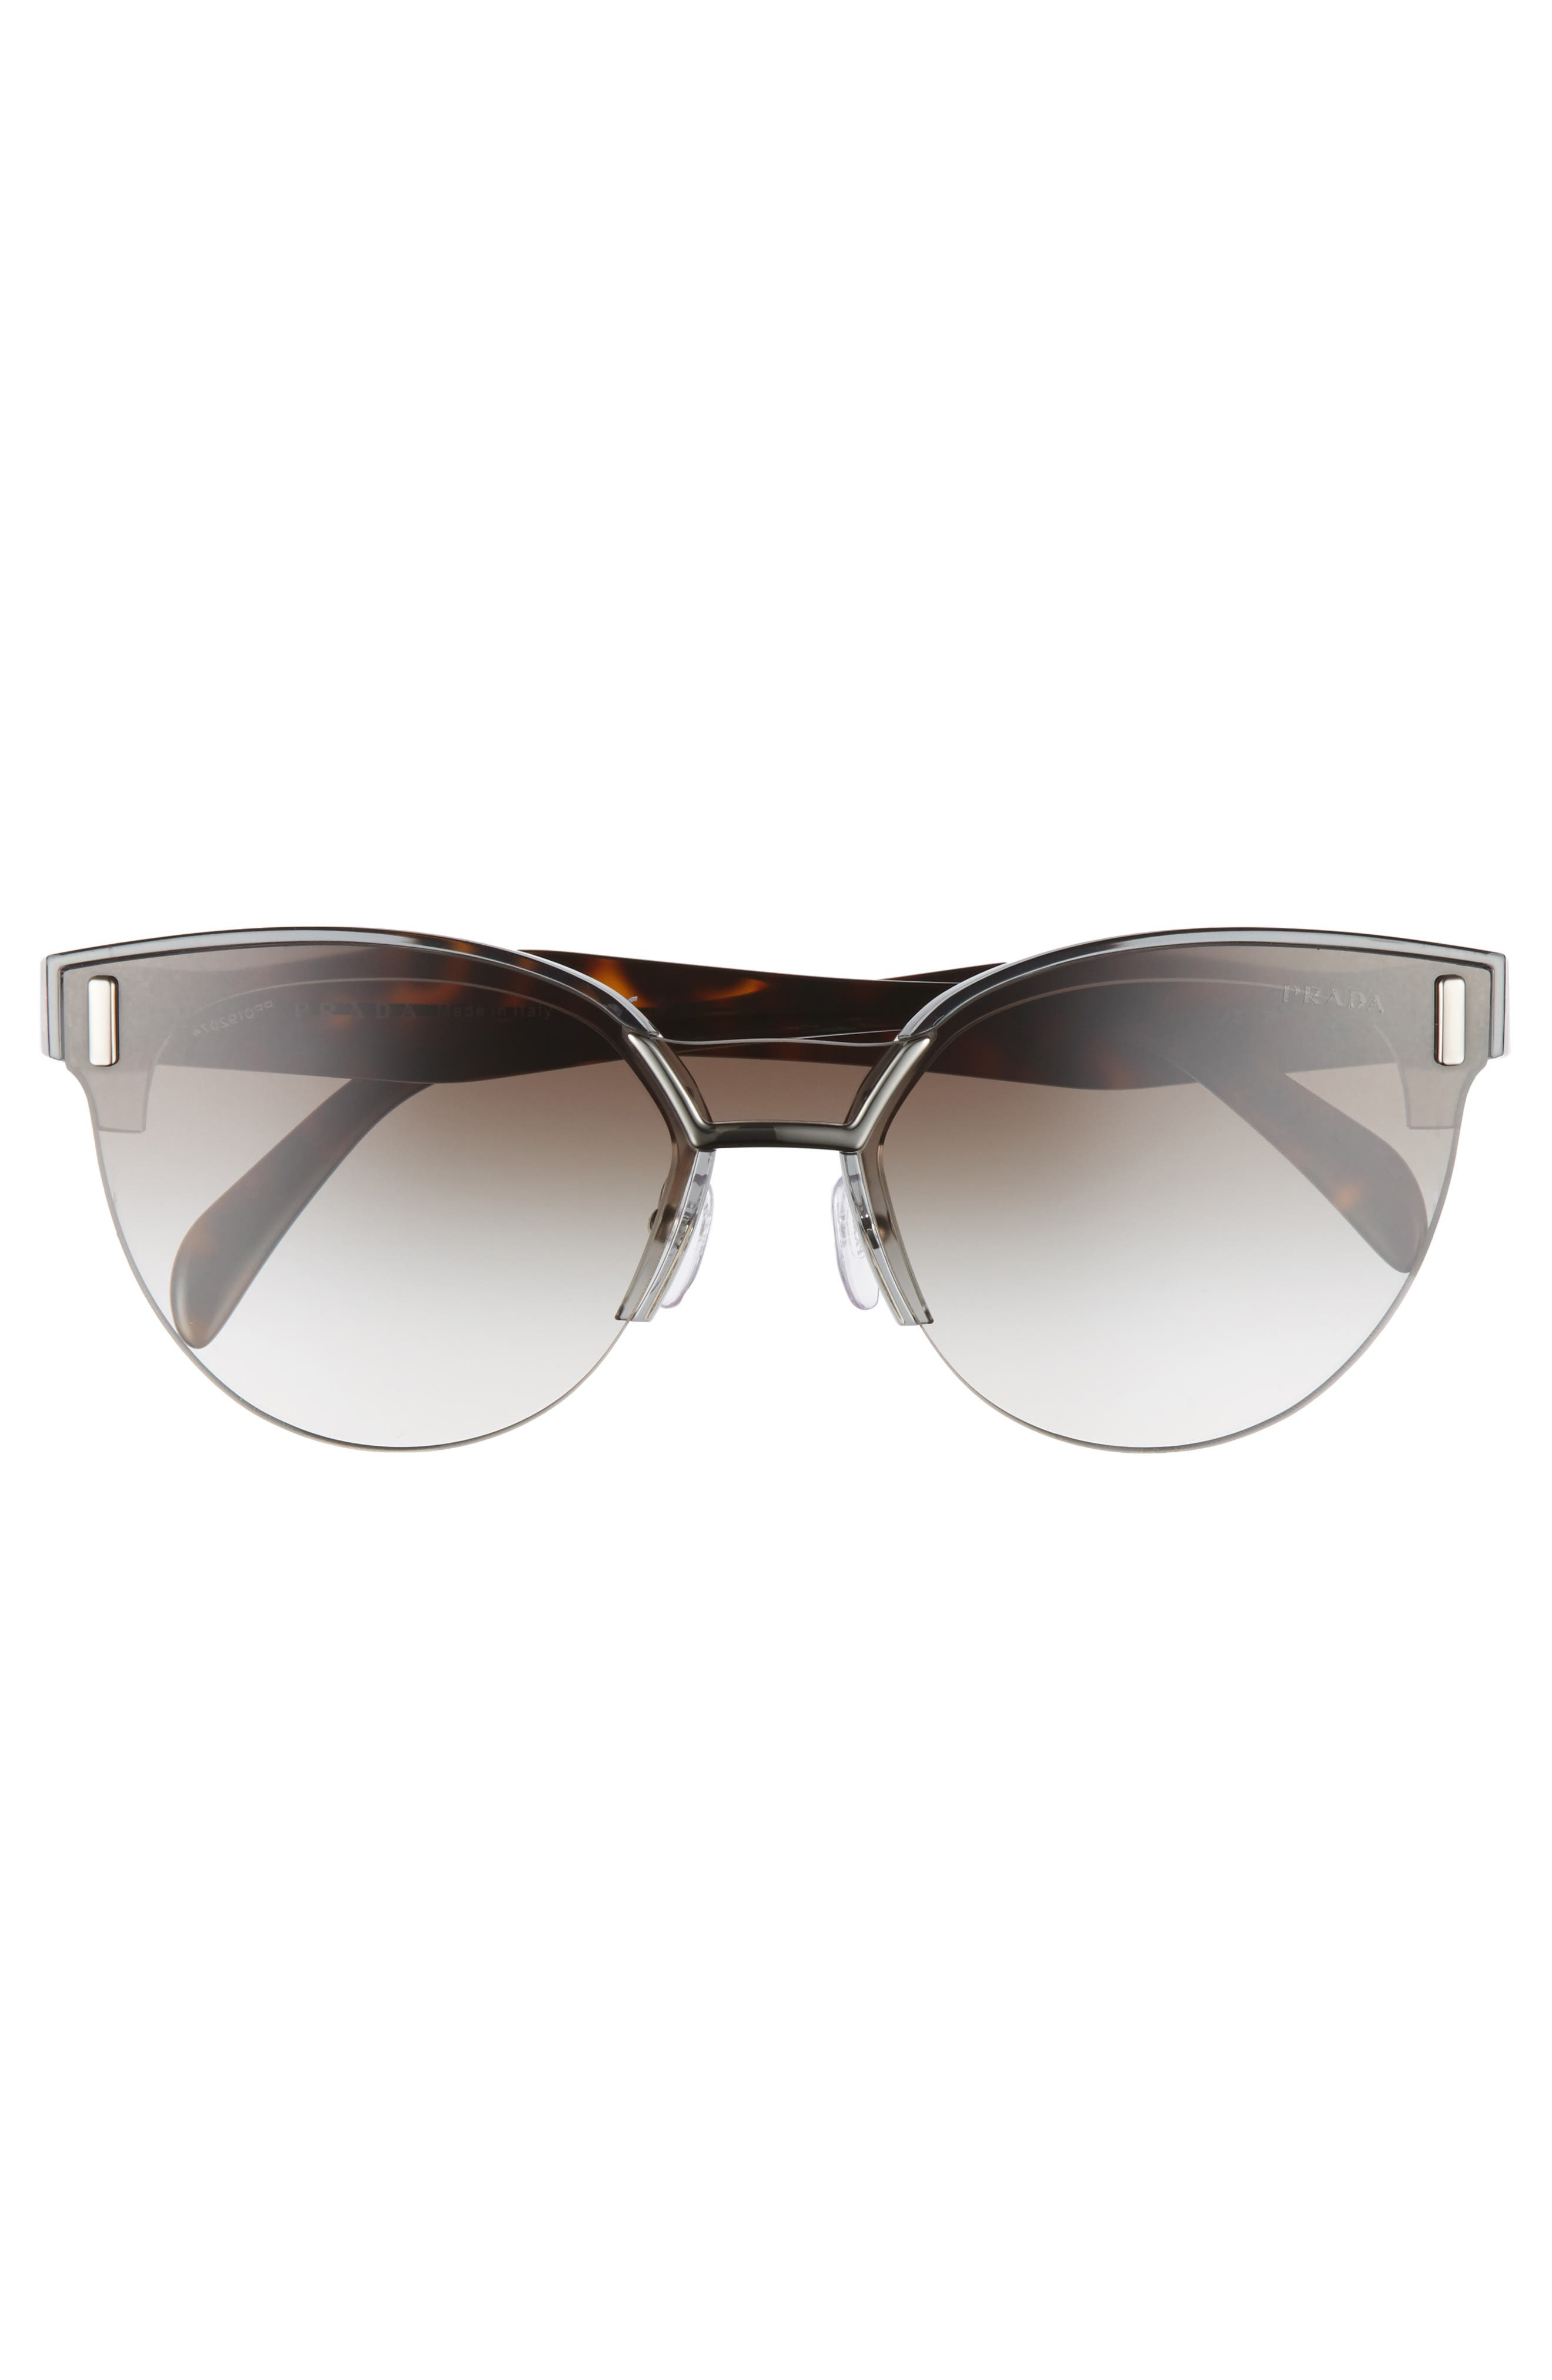 50mm Semi Rimless Gradient Sunglasses,                             Alternate thumbnail 4, color,